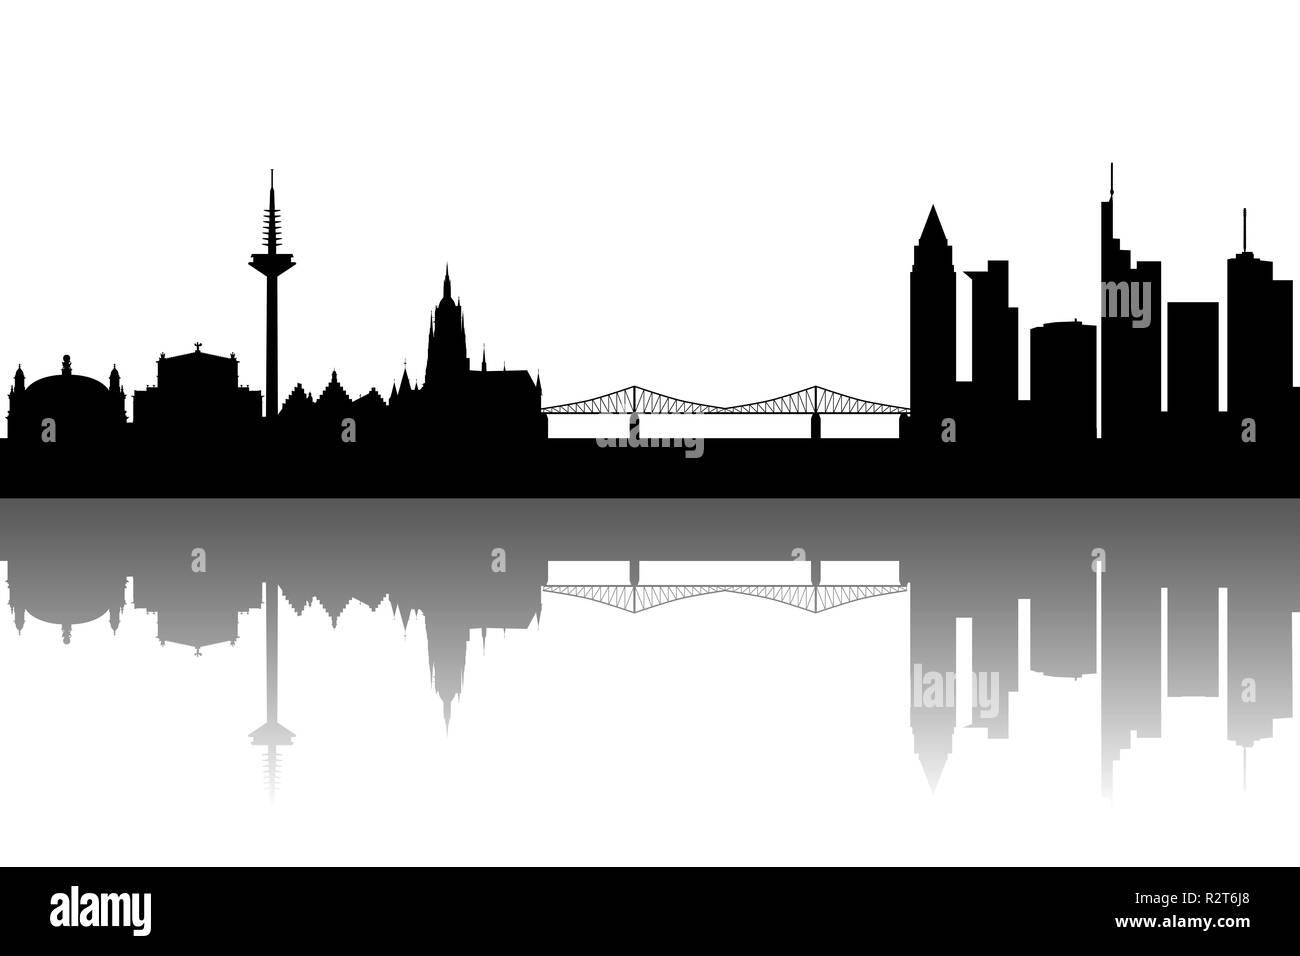 Frankfurt Abstract Stock Photo Alamy